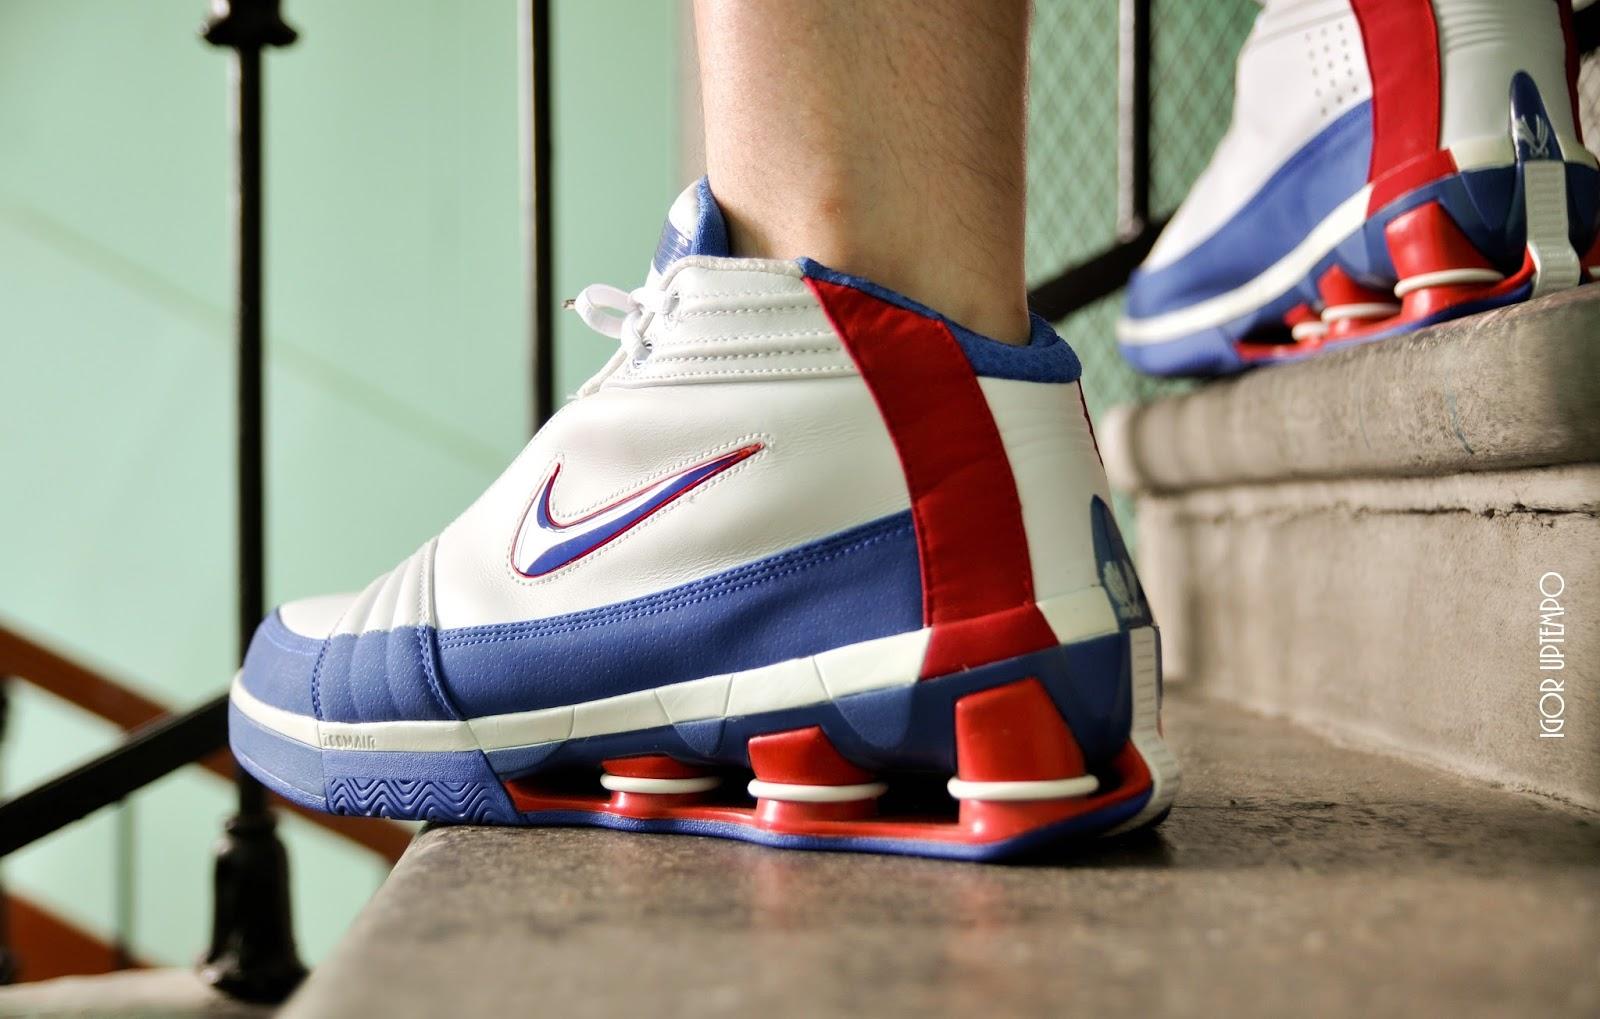 nike dunk hauts talons - Igor Uptempo\u0026#39;s Sneaker Blog: VC Week. Day VI. WOMFT: 2005 Nike ...